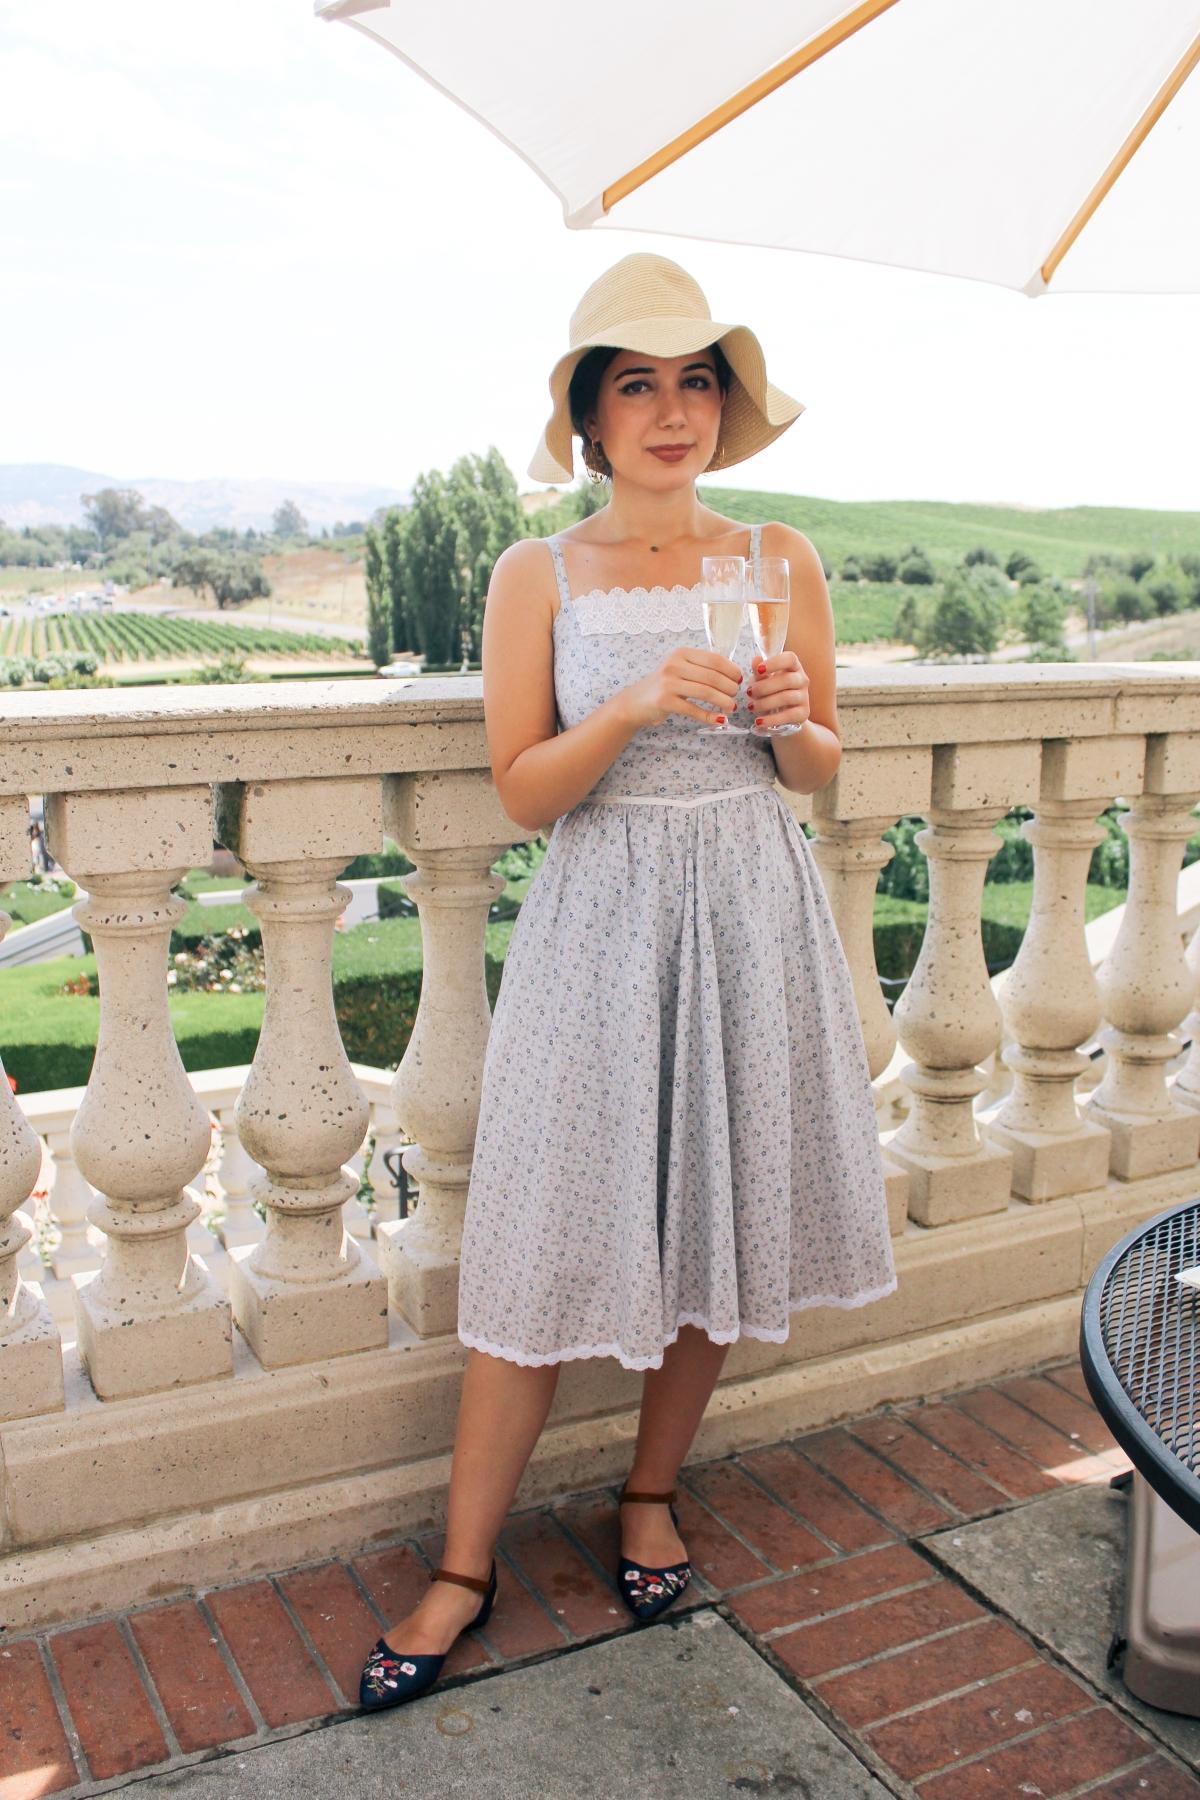 Domaine Carneros Winery, Napa outfit, Napa Valley, landscape photography, sundress, ootd, vintage dress, floppy hat, embellished flats, summer style, sparkling wine